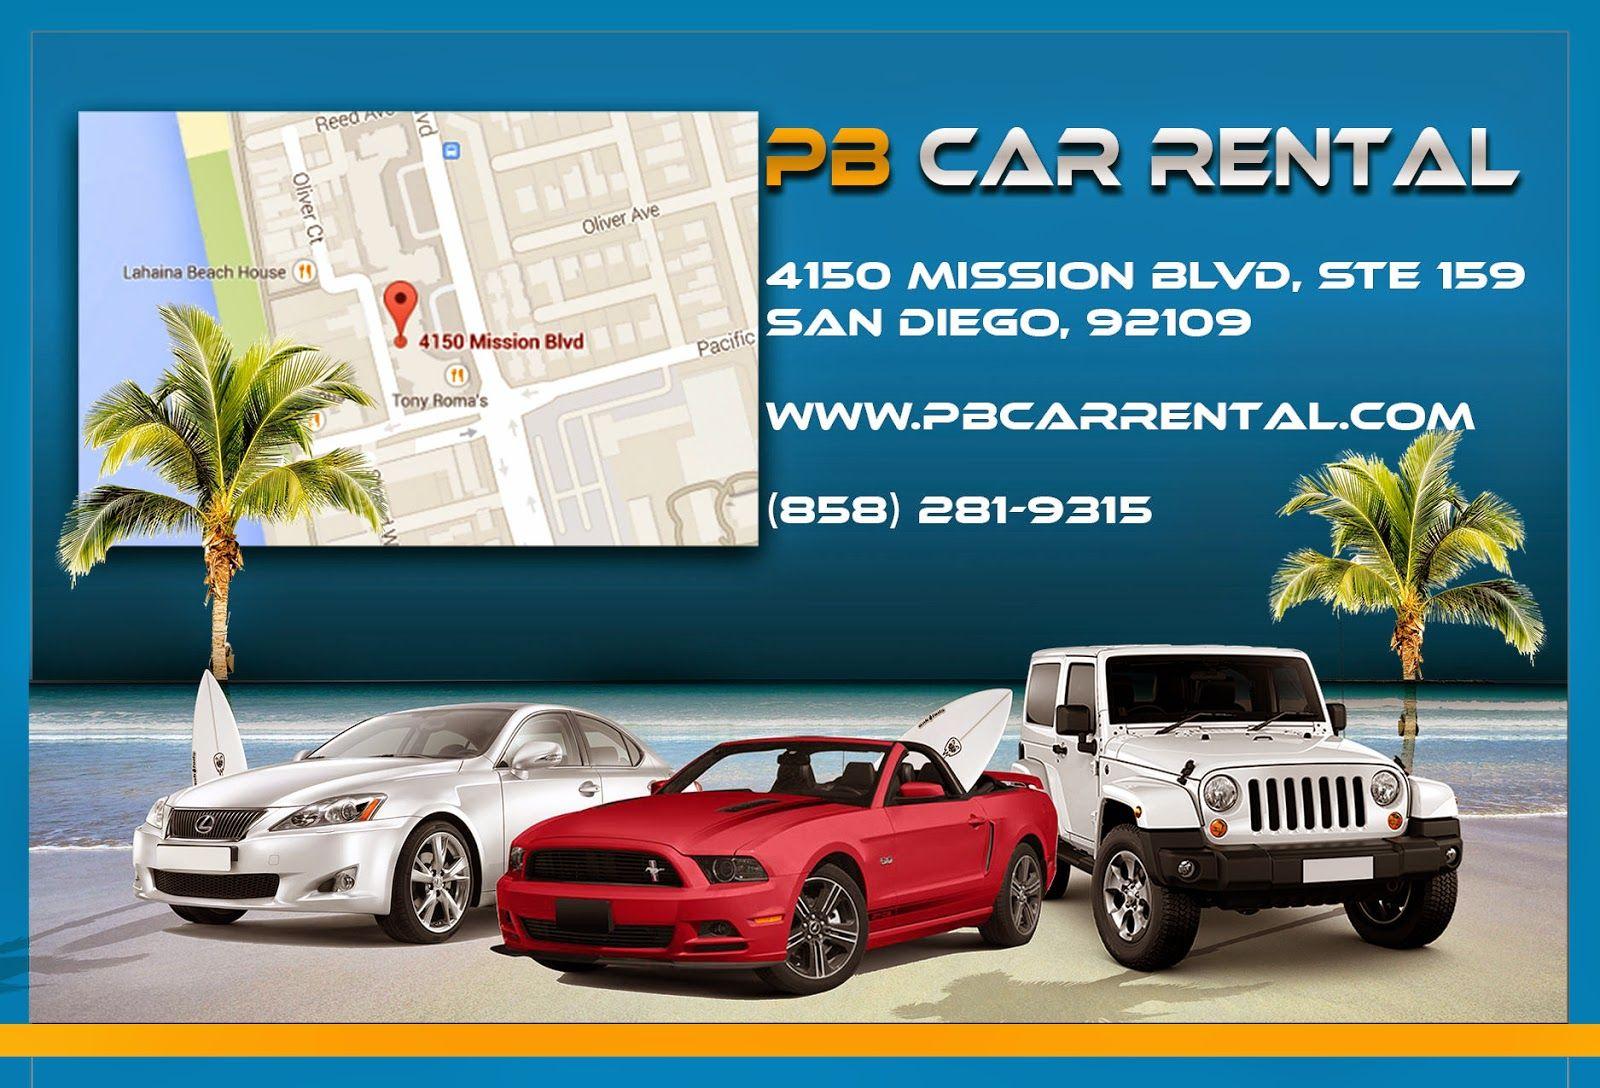 Car Rental In Sango For International Students Cheap Car Rental In San Go Offers